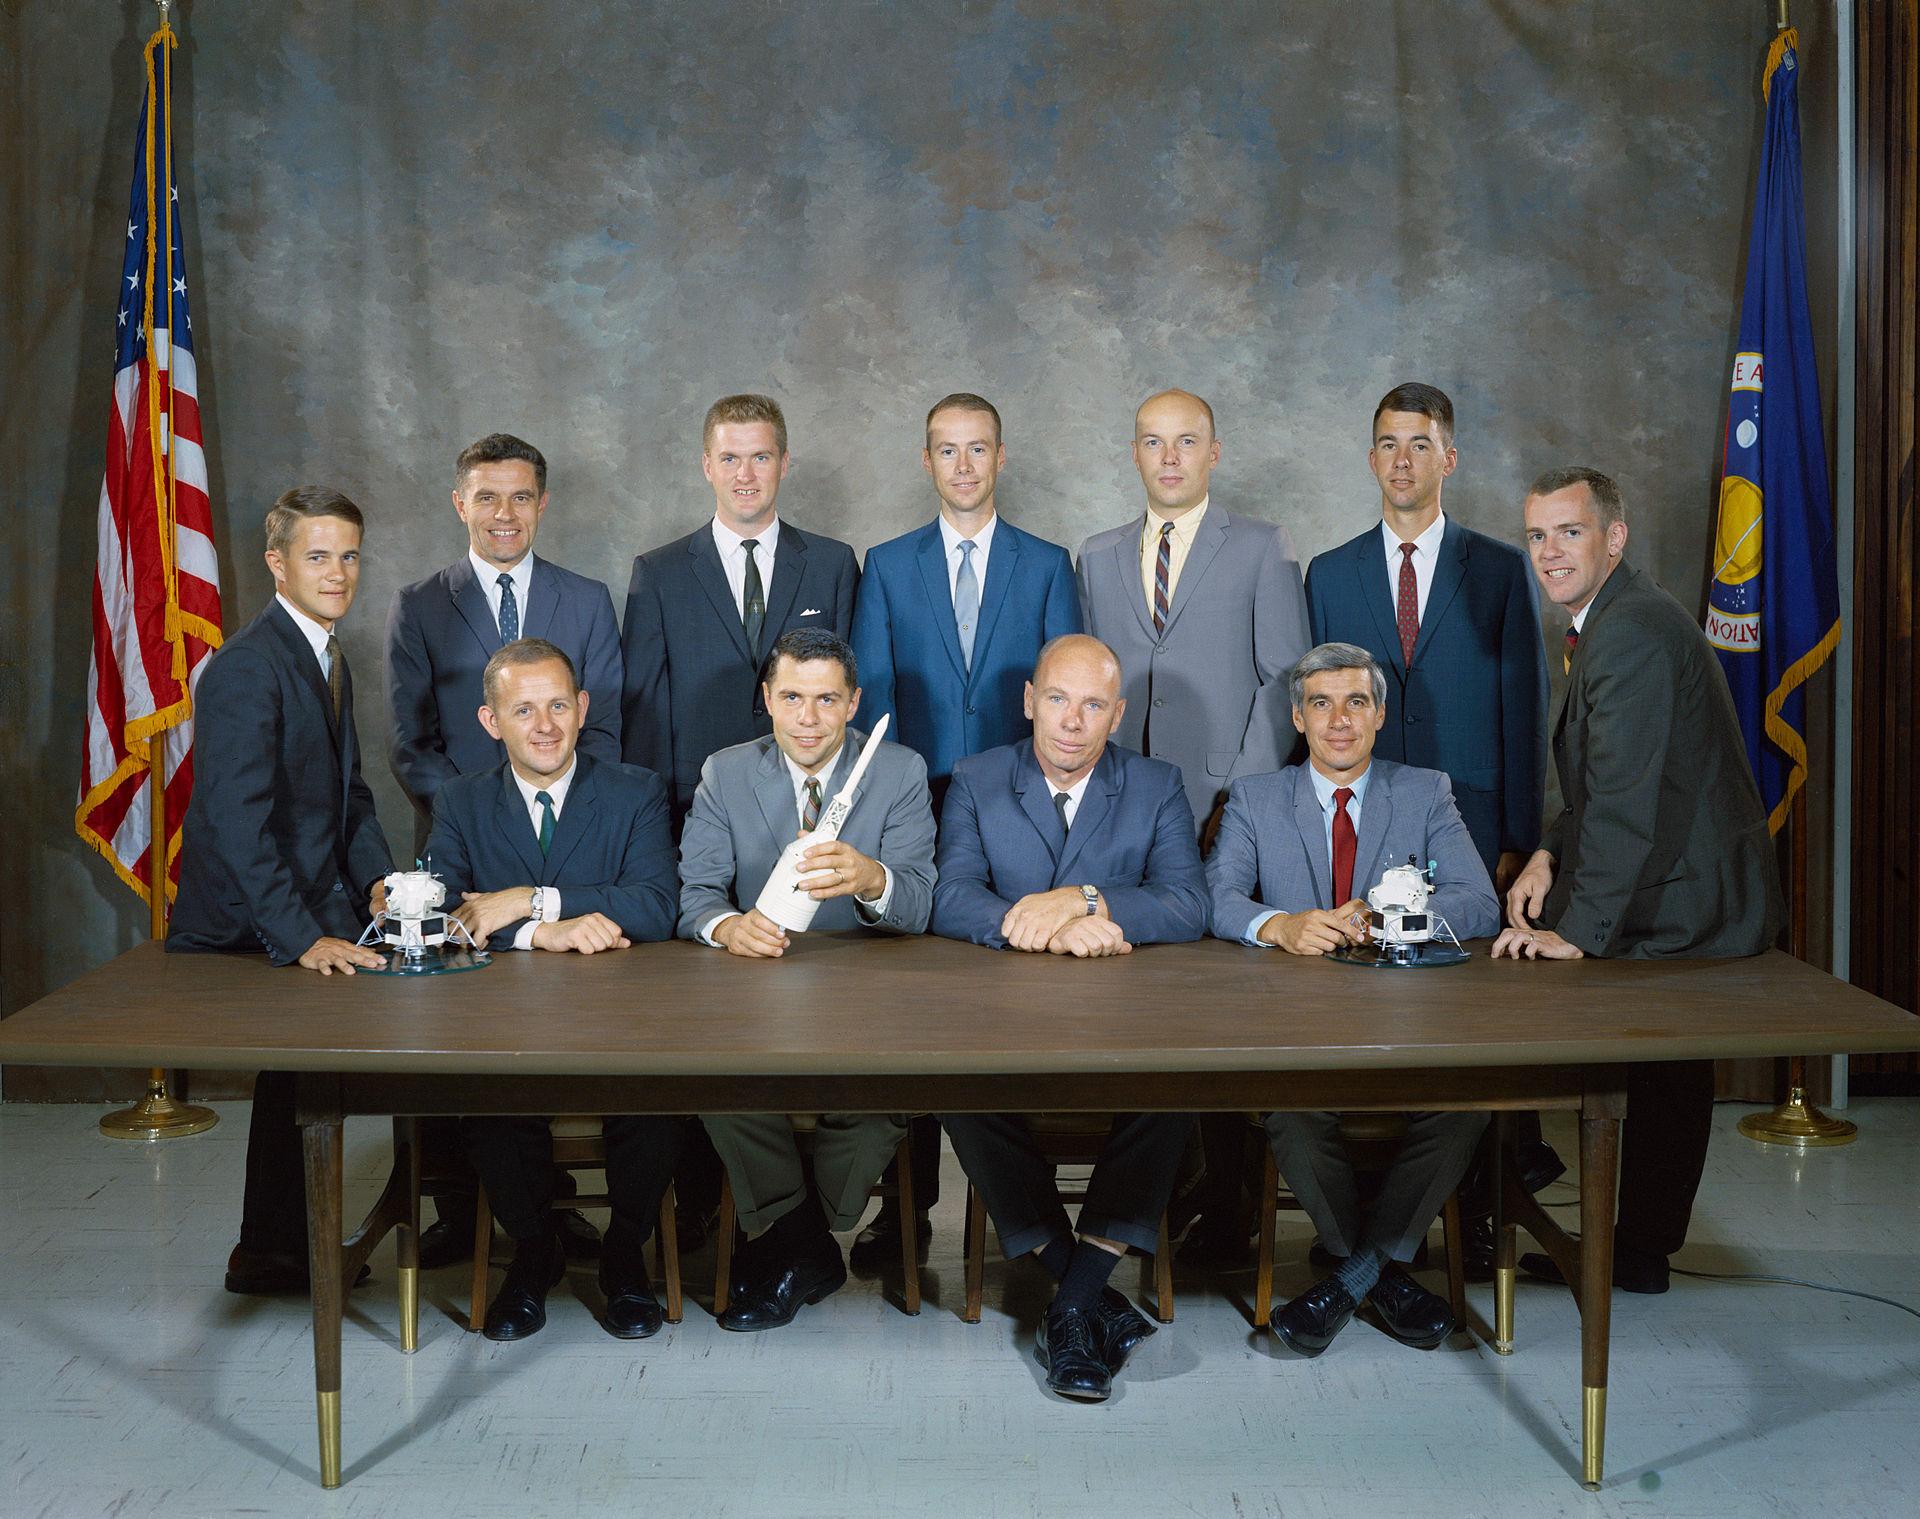 Nasa Astronaut Group 6 Wikipedia